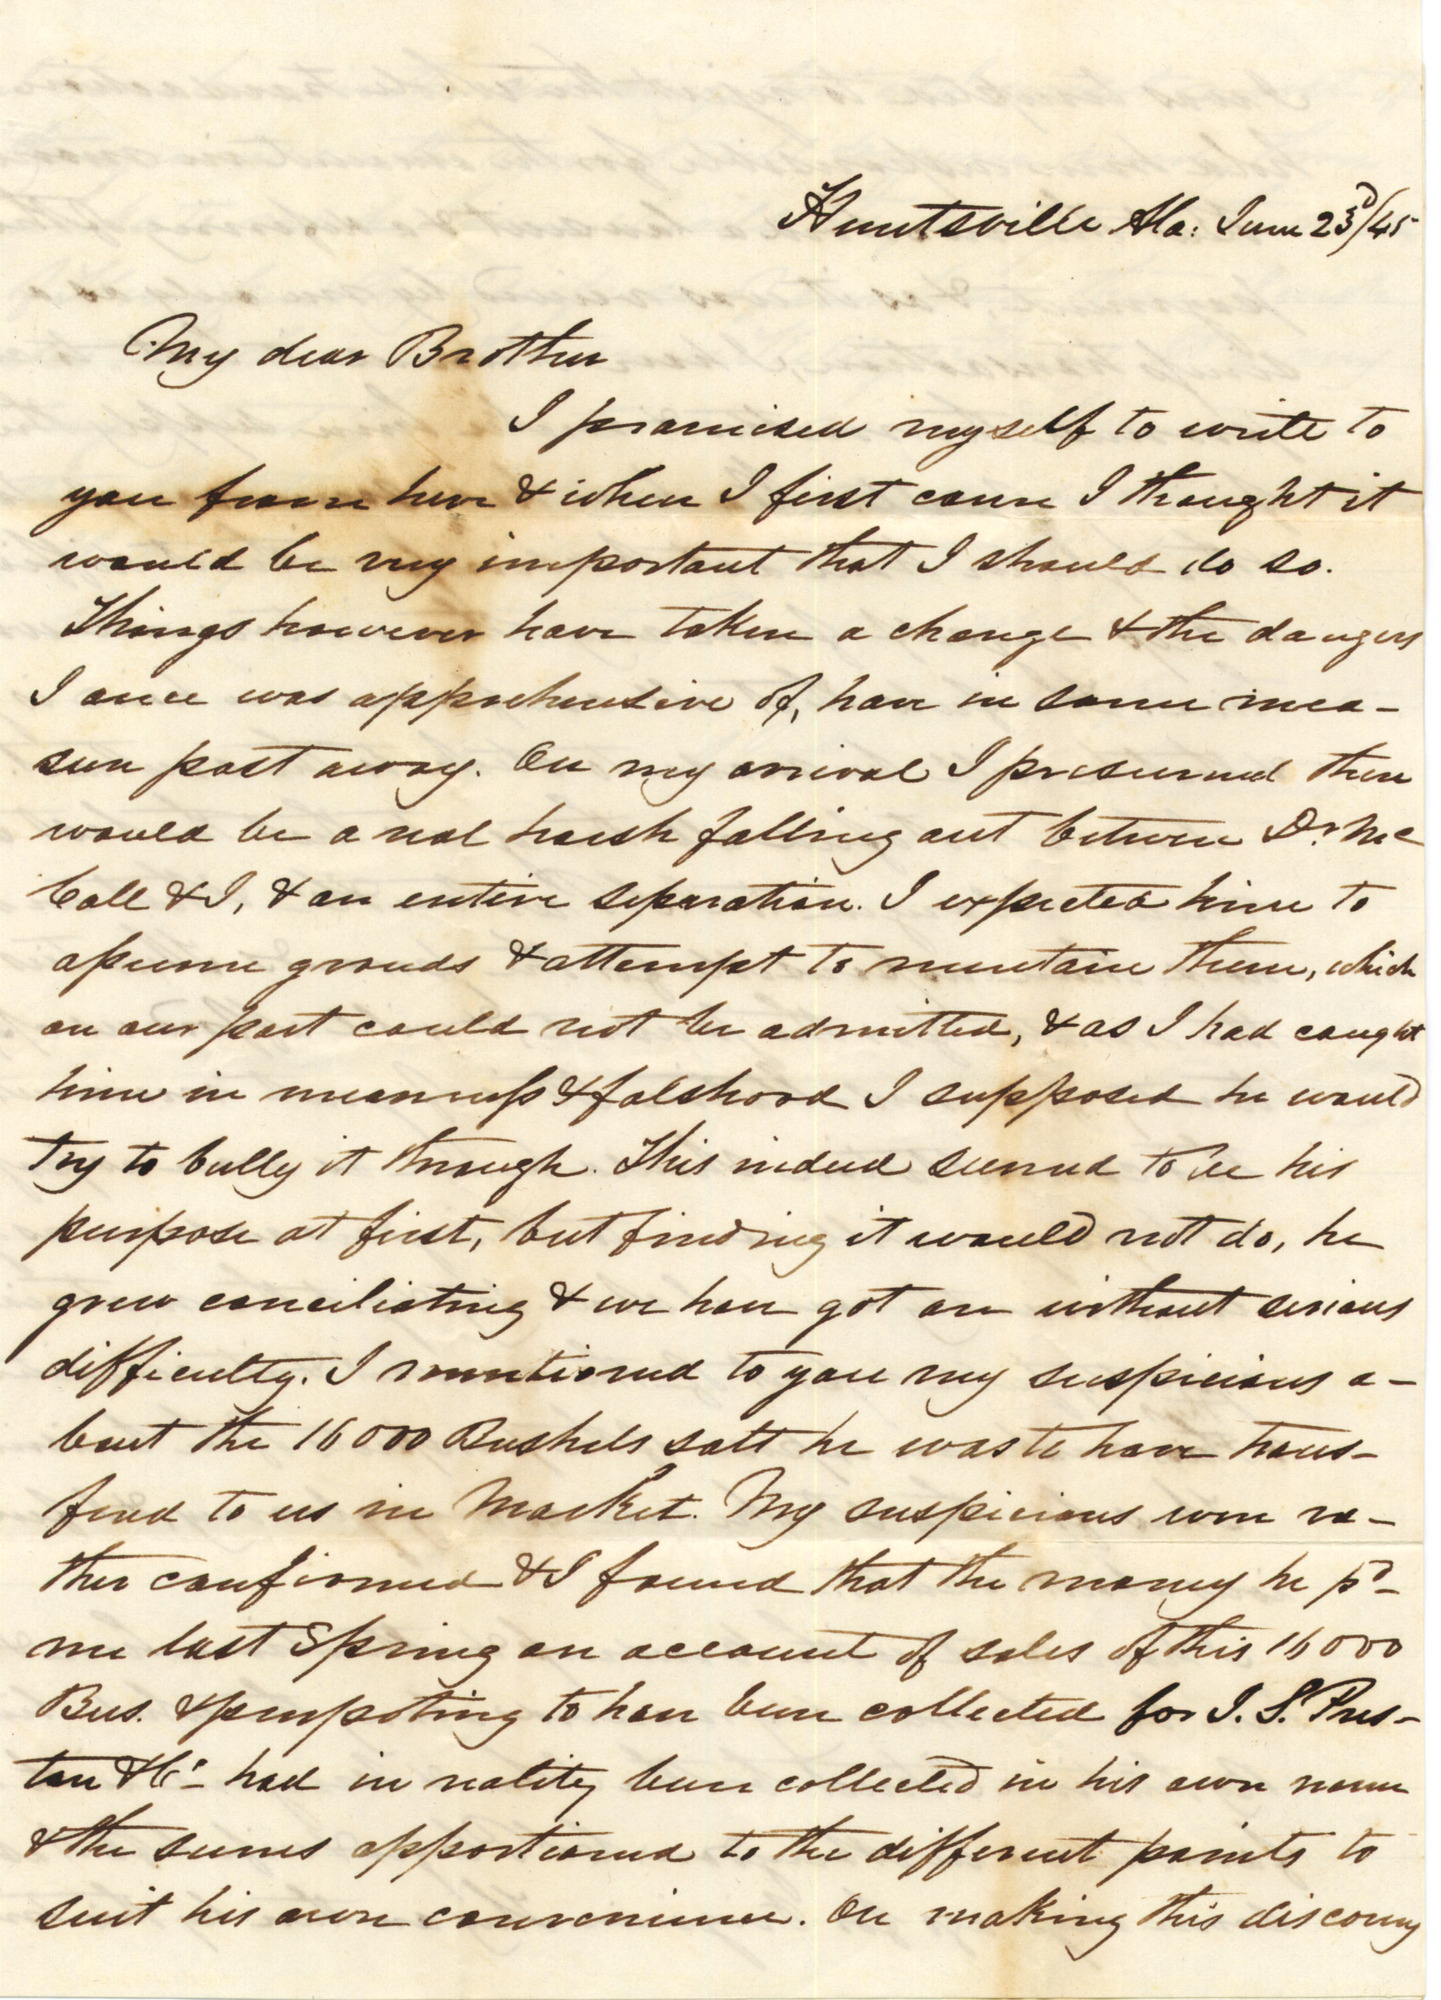 Ms1997_002_SmithfieldPreston_Letter_1845_0623a.jpg